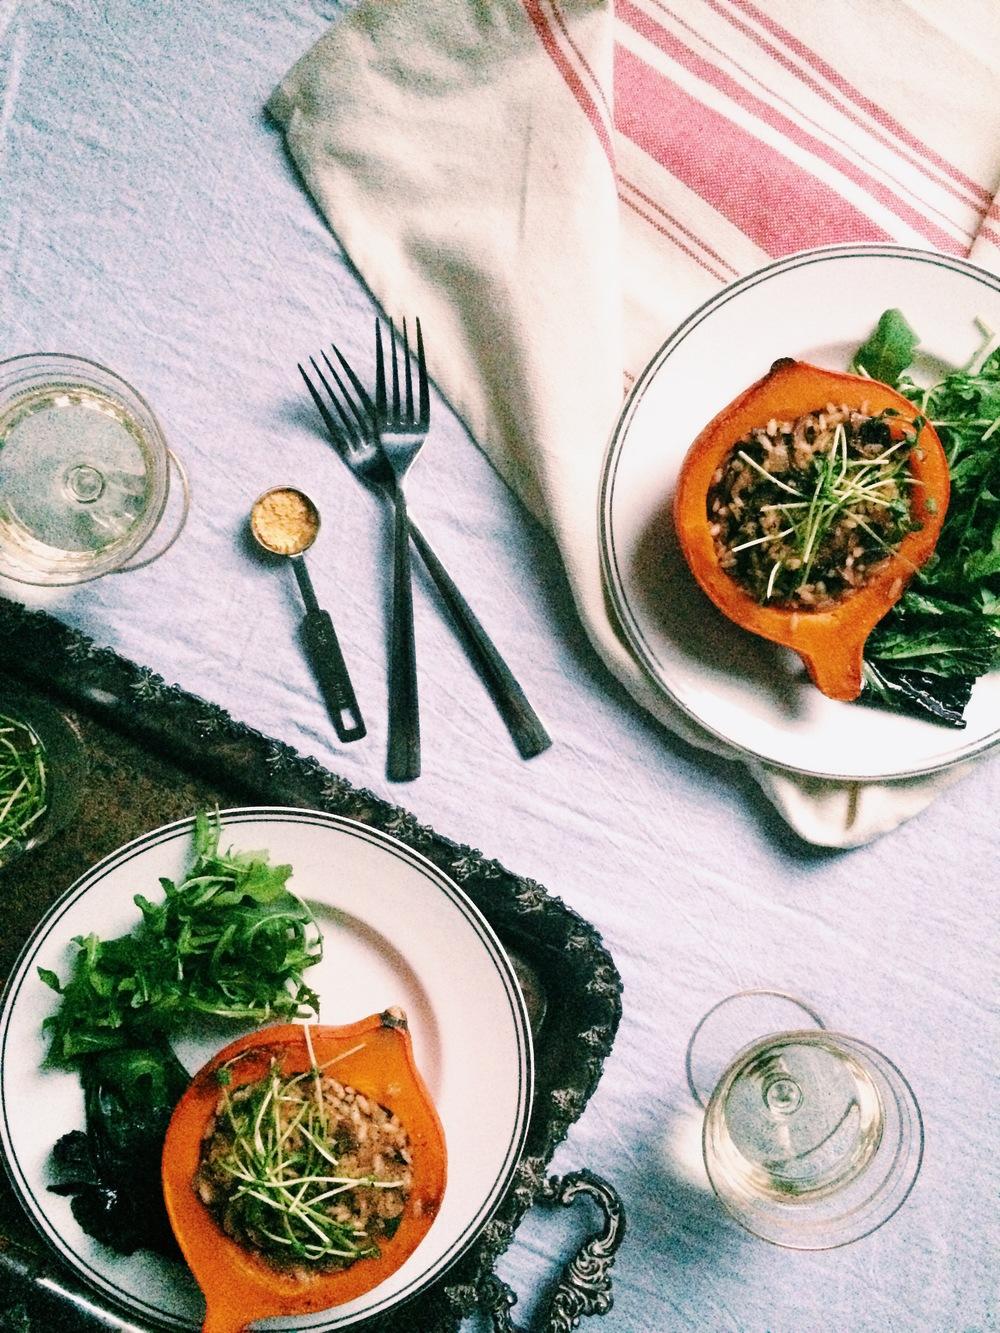 Red Kuri Squash And Wild Mushroom Risotto Recipes — Dishmaps